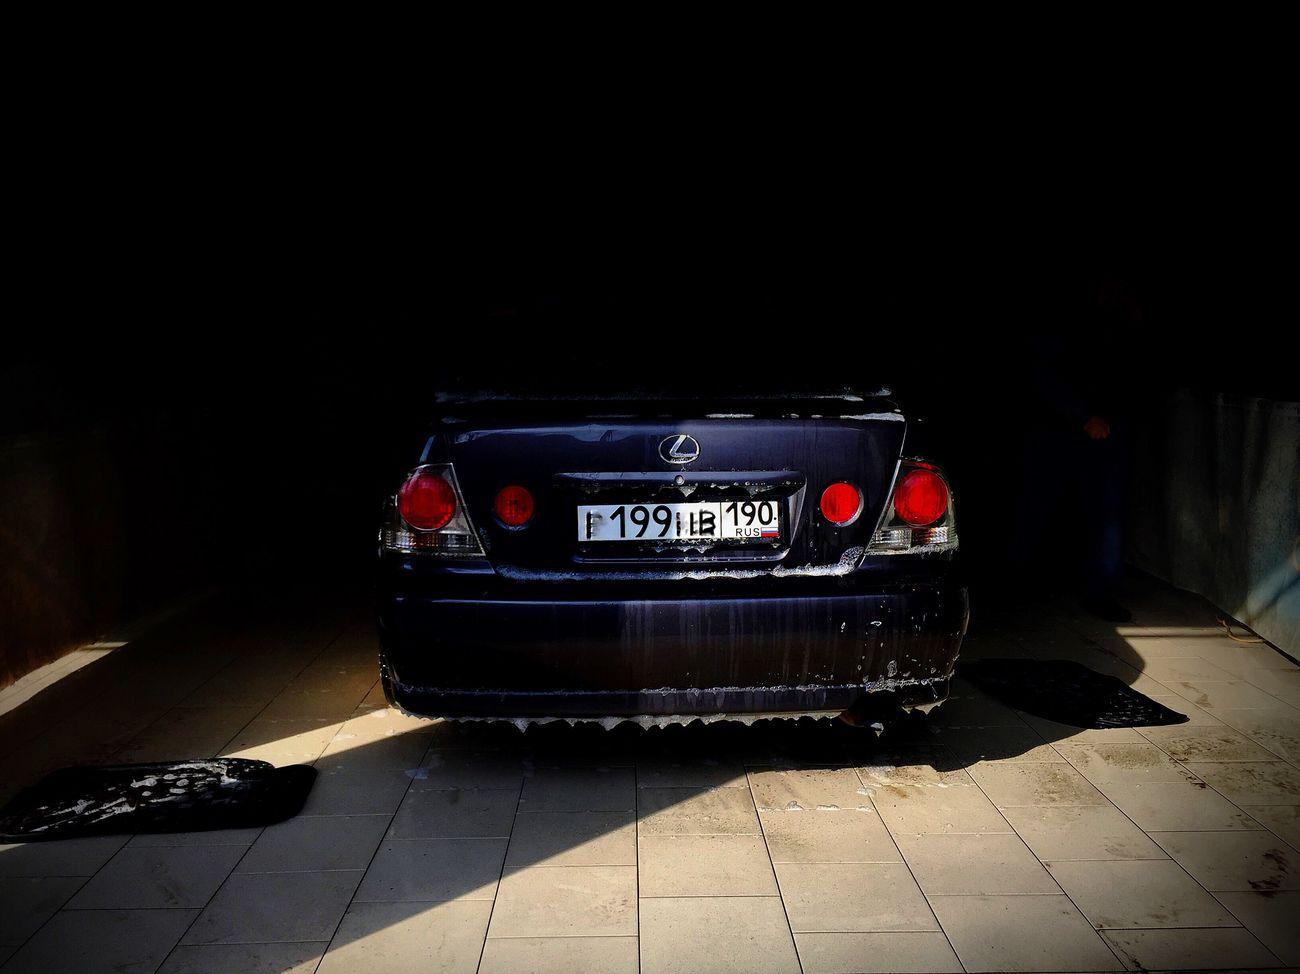 Lexus Lexus Is300 Lexus Is200 Altezza Car Cars CarShow Beauty Photo Followme Like Good Automobile Auto Avto Like4like Likes Likeforlike Photography Follow Follow4follow Beautiful Photoshoot